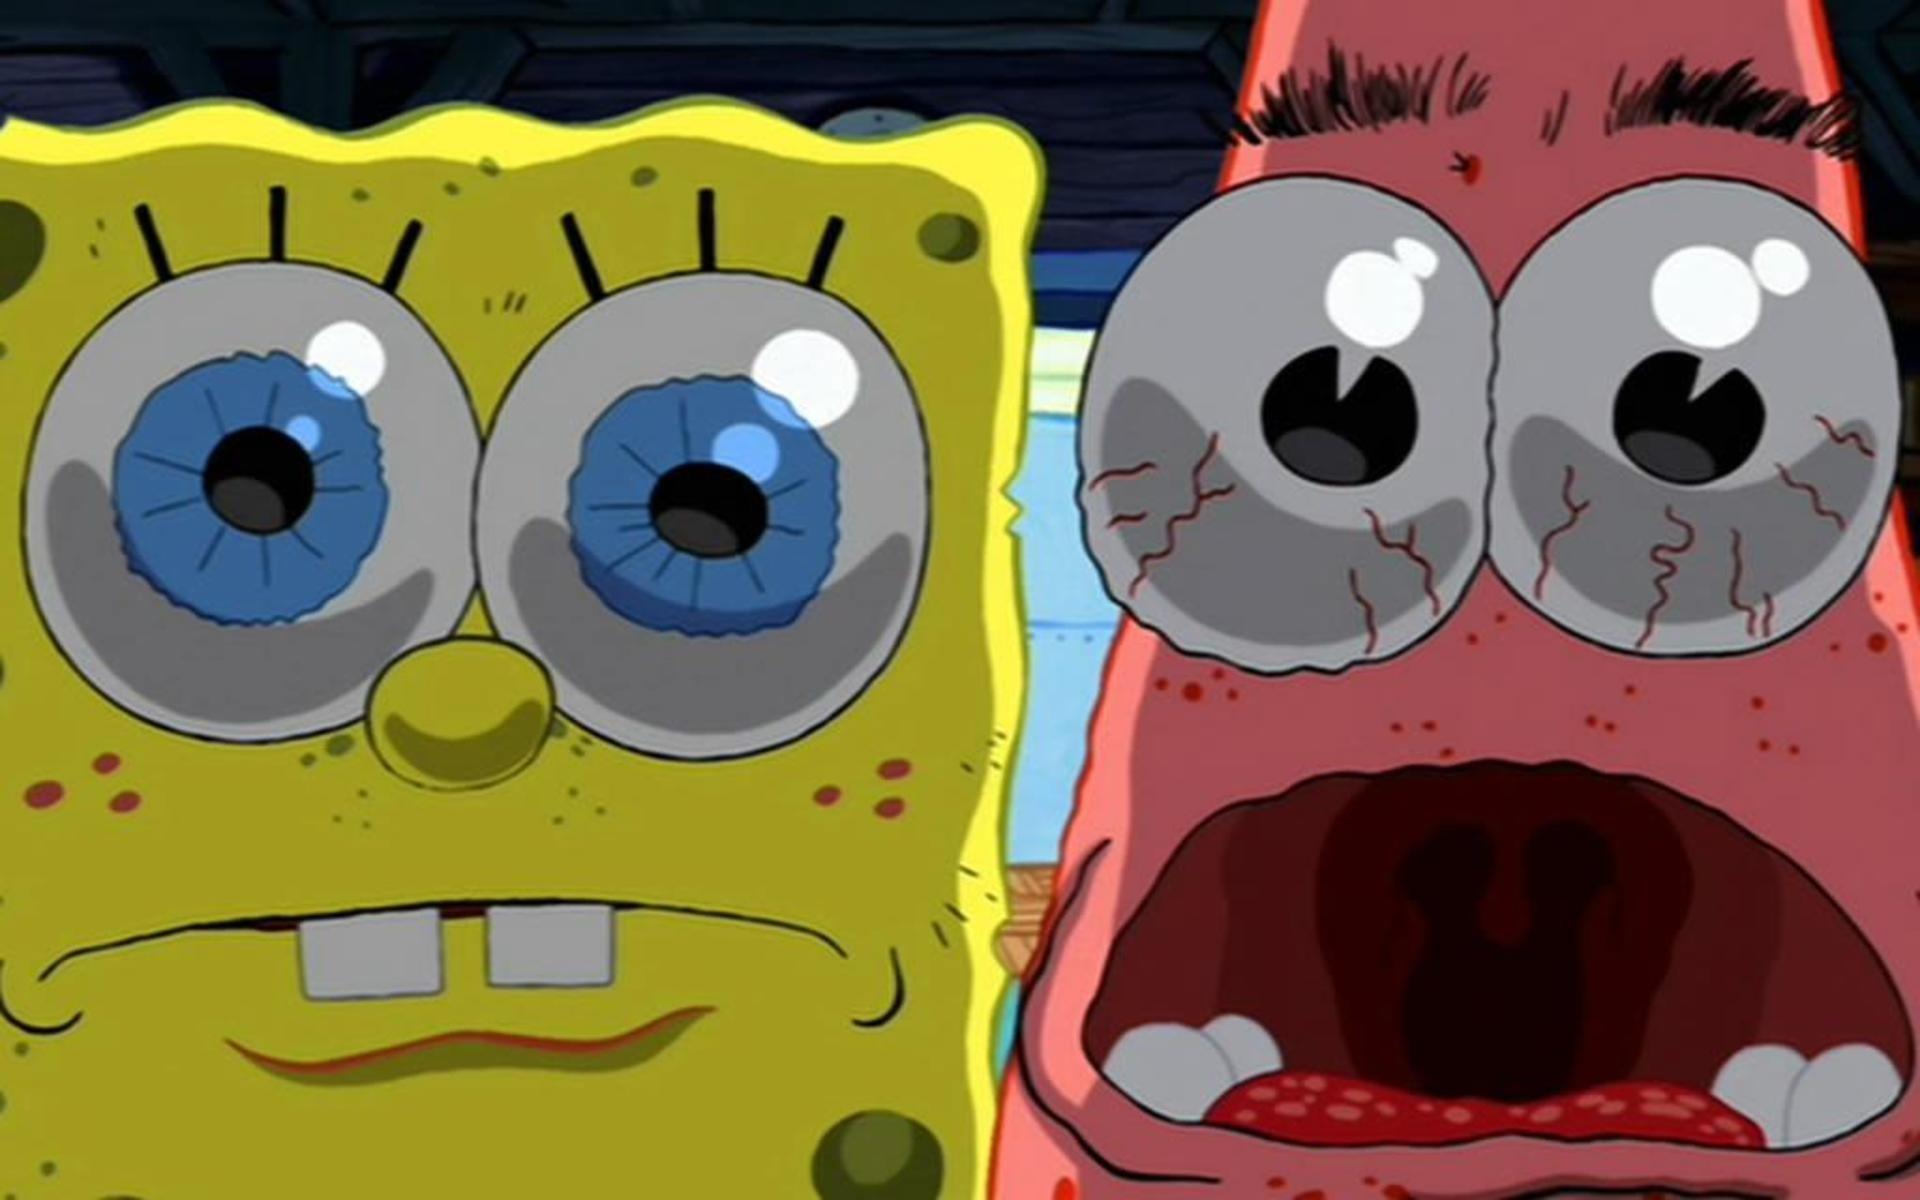 Download Spongebob And Patrick Star HD Wallpaper (5020) Full Size .